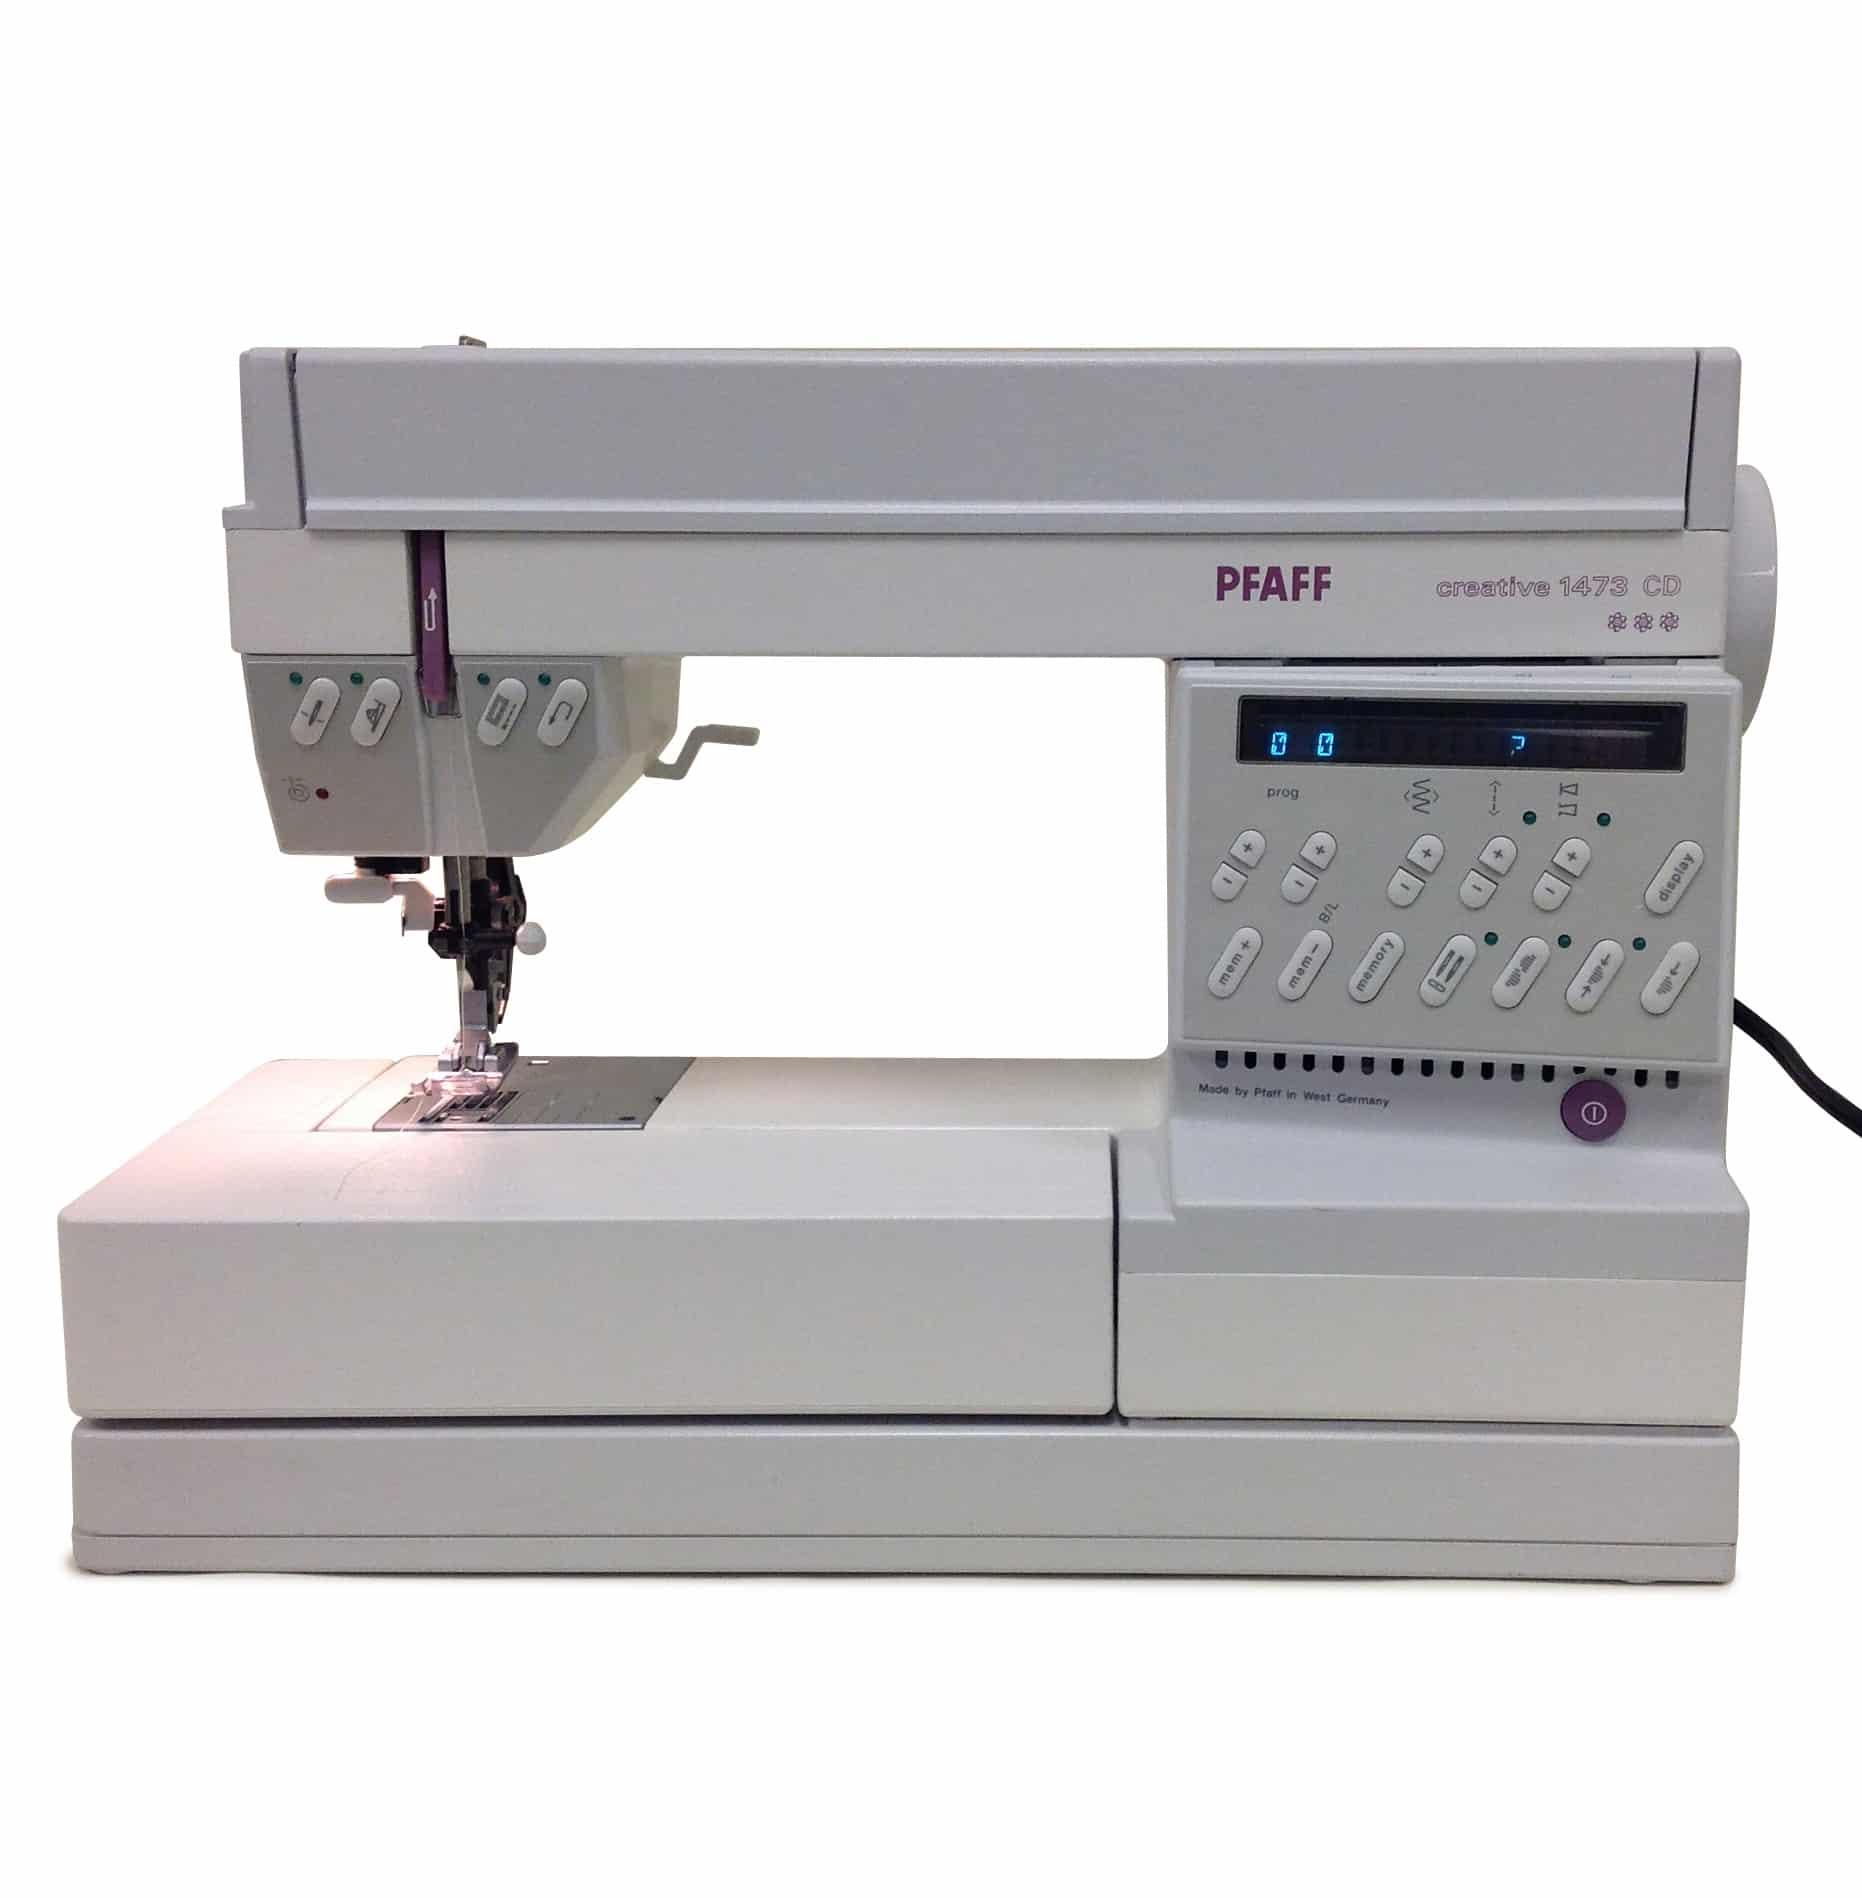 Pfaff creative 1473 pre owned brubaker 39 s sewing center for Macchine pfaff